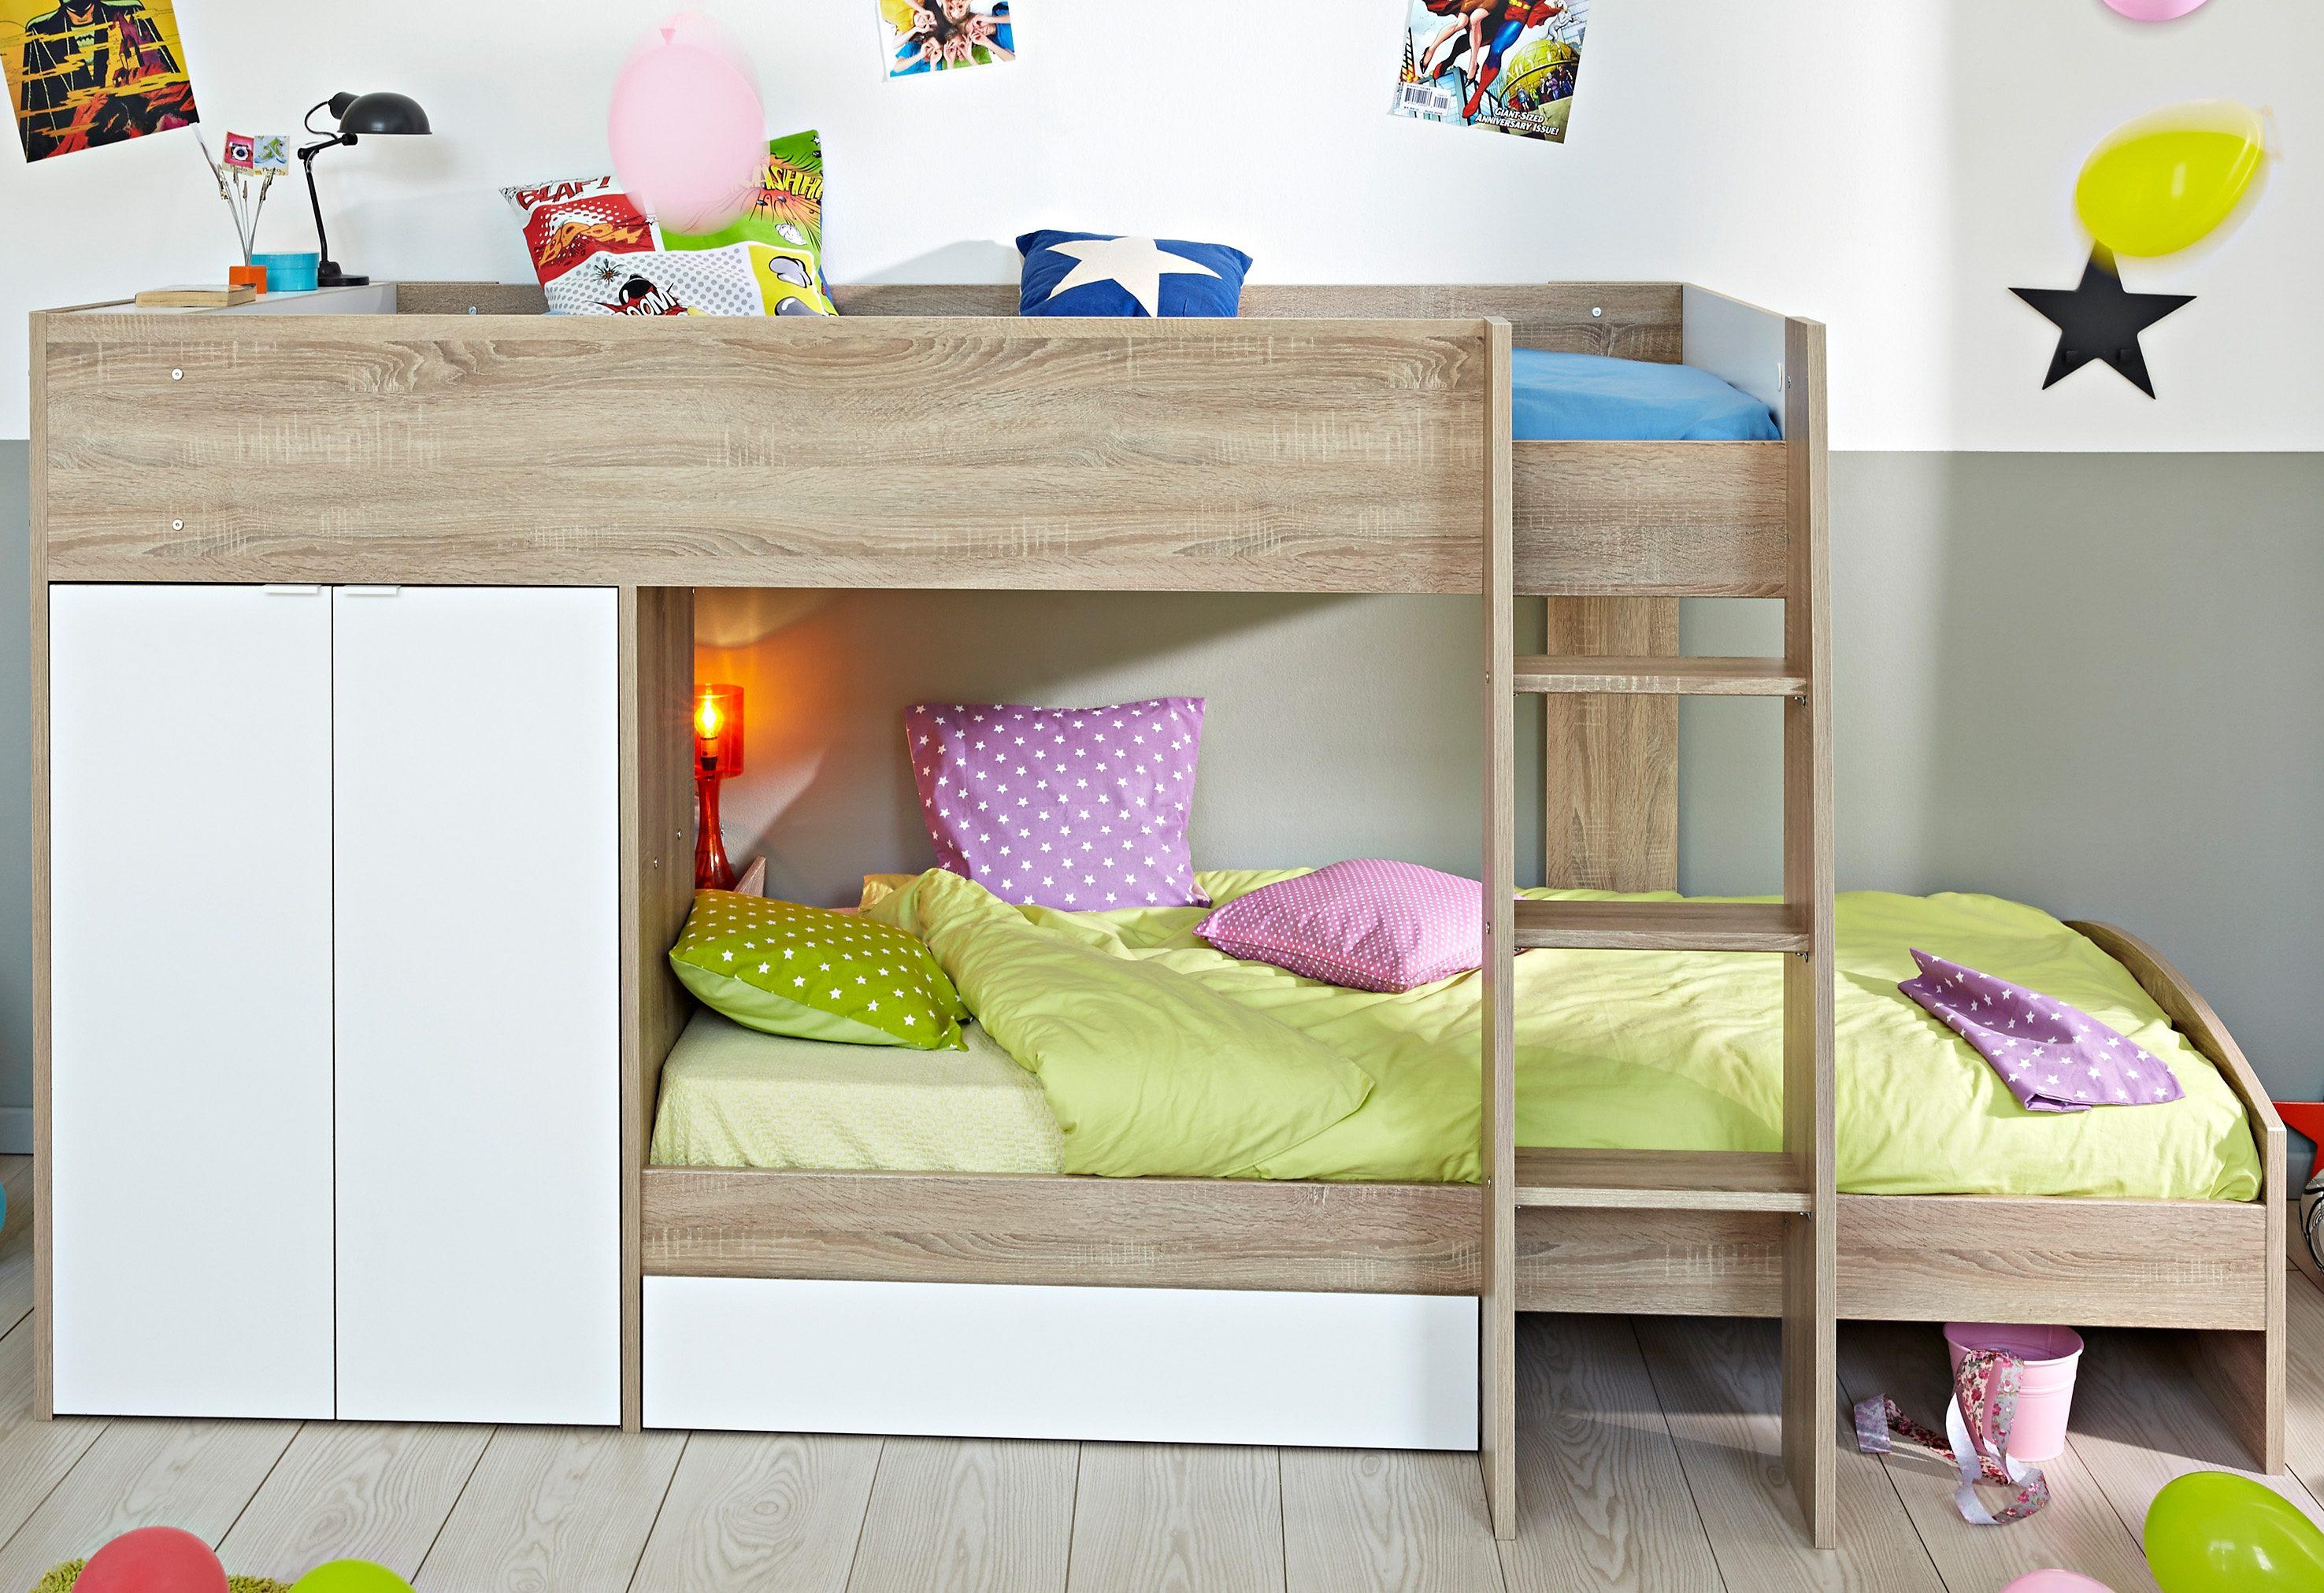 Dreier Etagenbett : Etagenbett doppelstockbett online kaufen stockbett otto